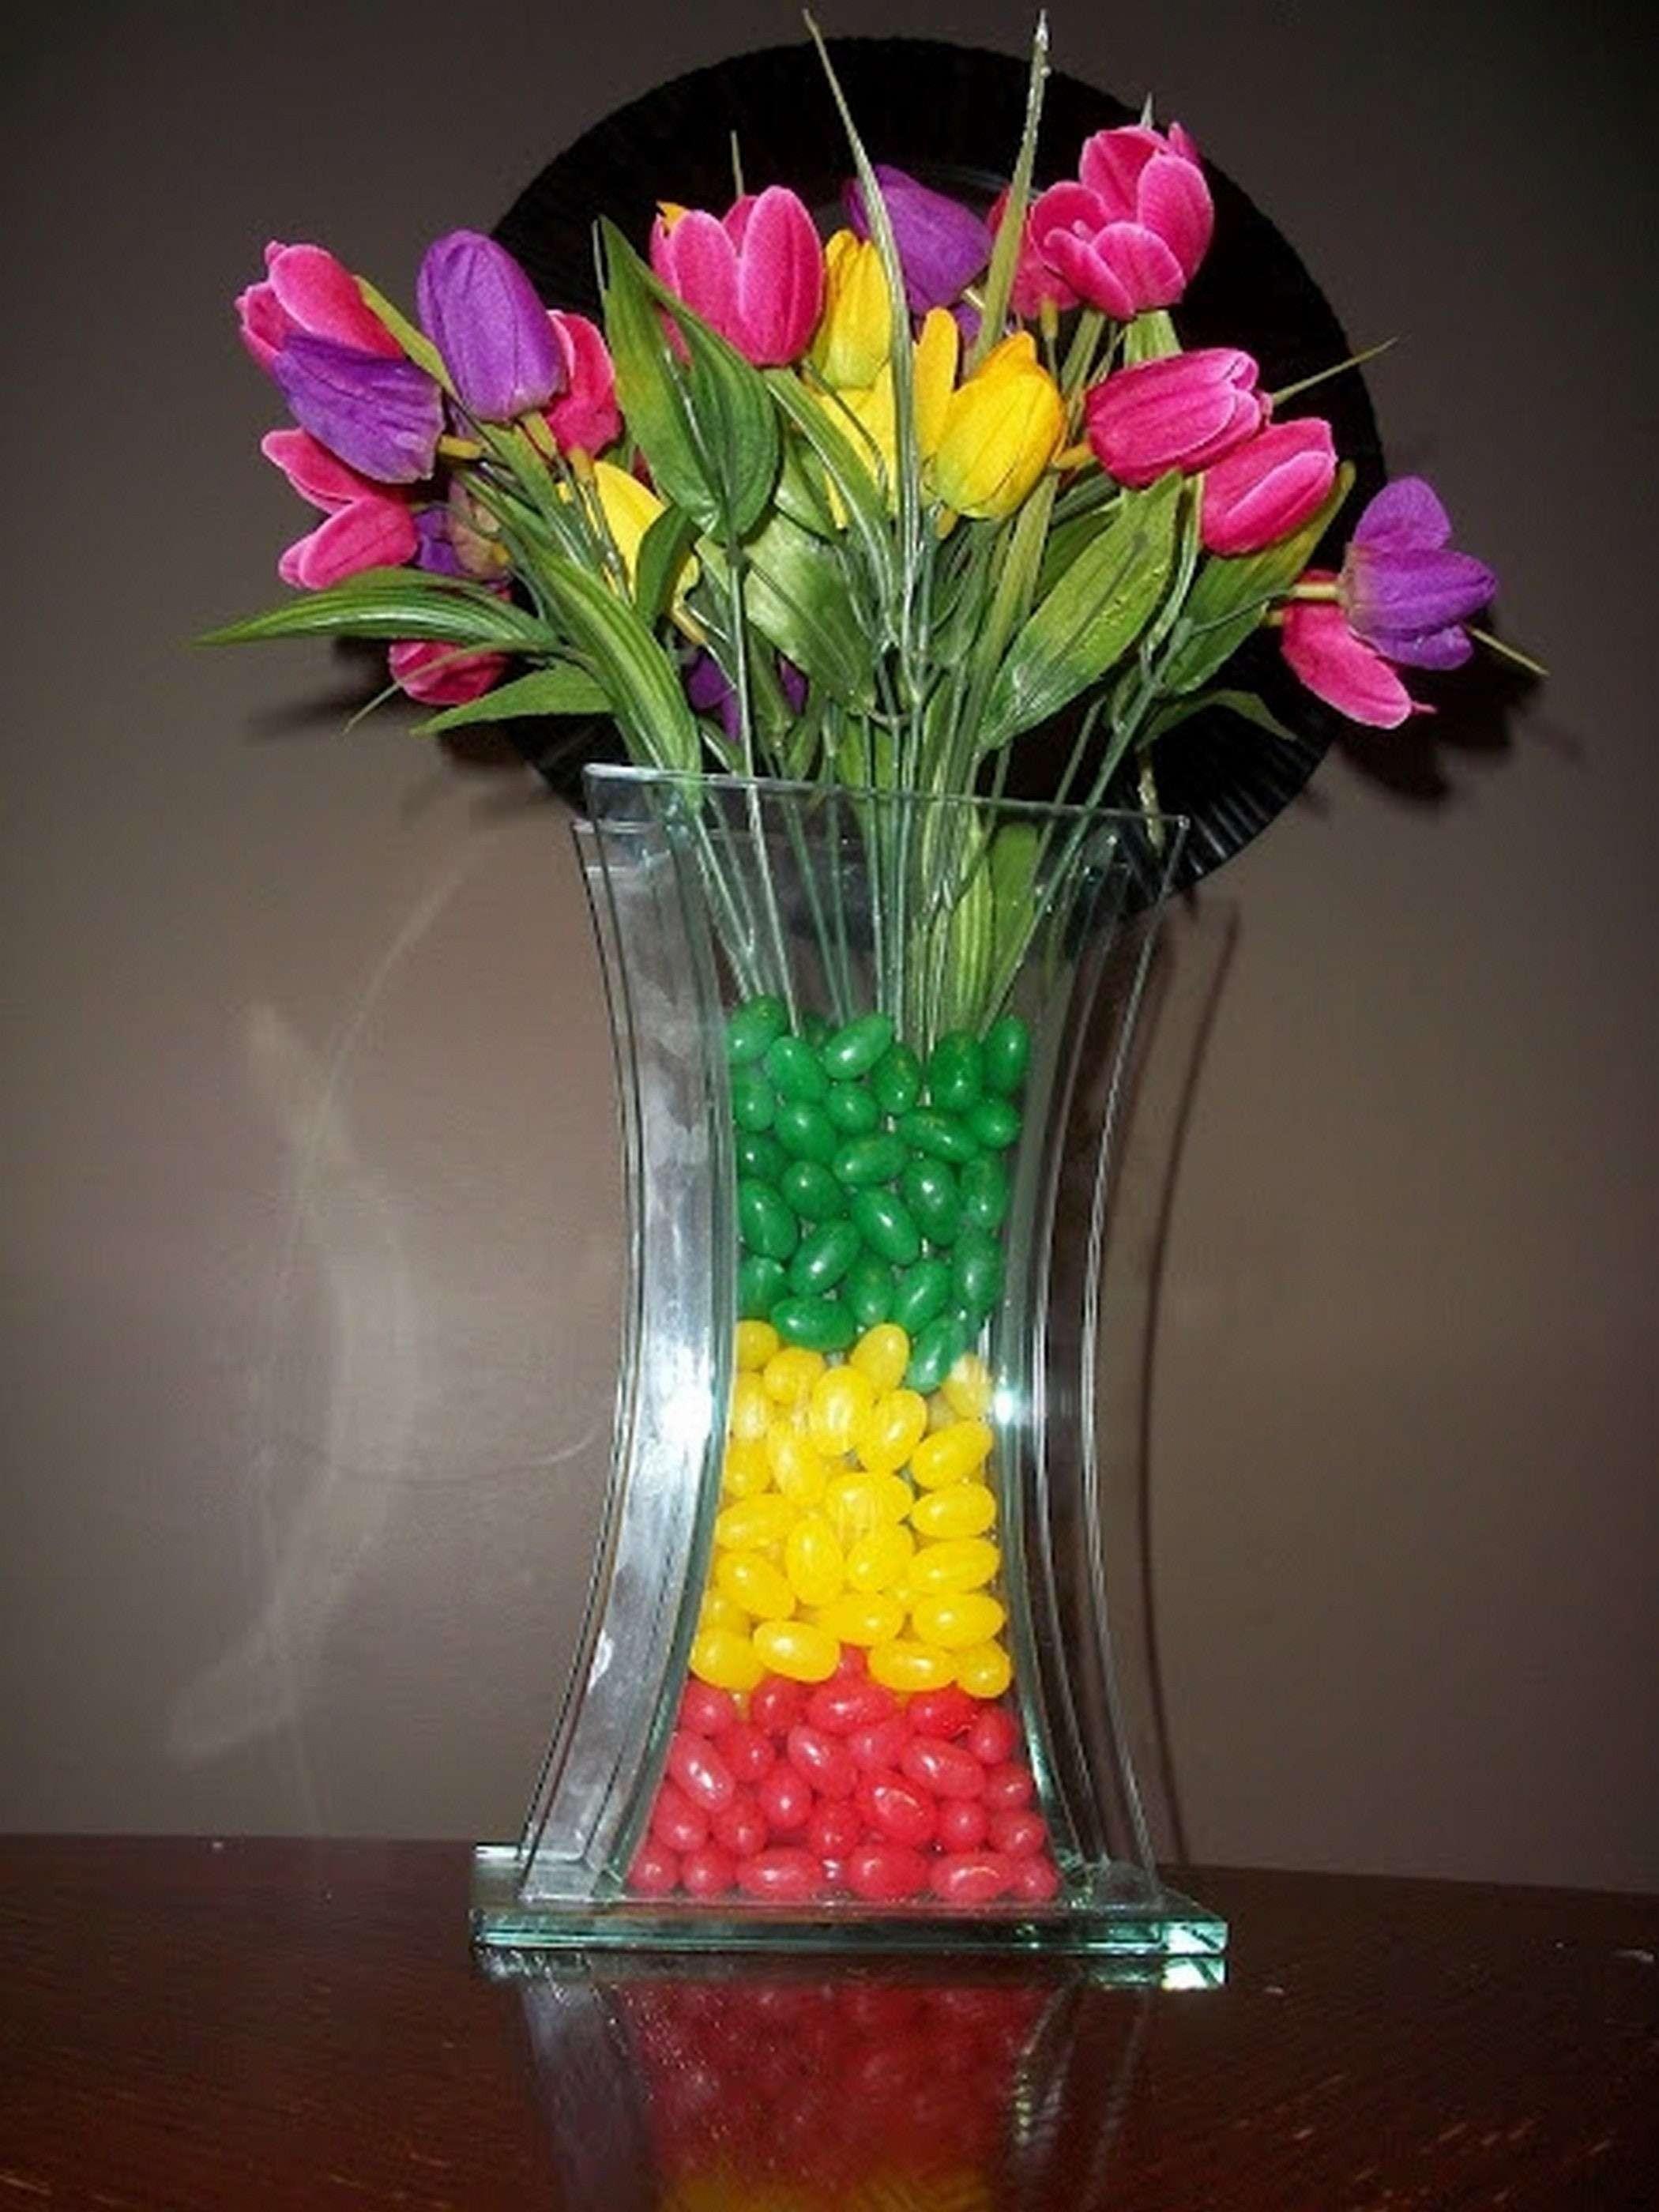 clear square vase of 15 cheap and easy diy vase filler ideas 3h vases flower i 0d scheme in 15 cheap and easy diy vase filler ideas 3h vases flower i 0d scheme